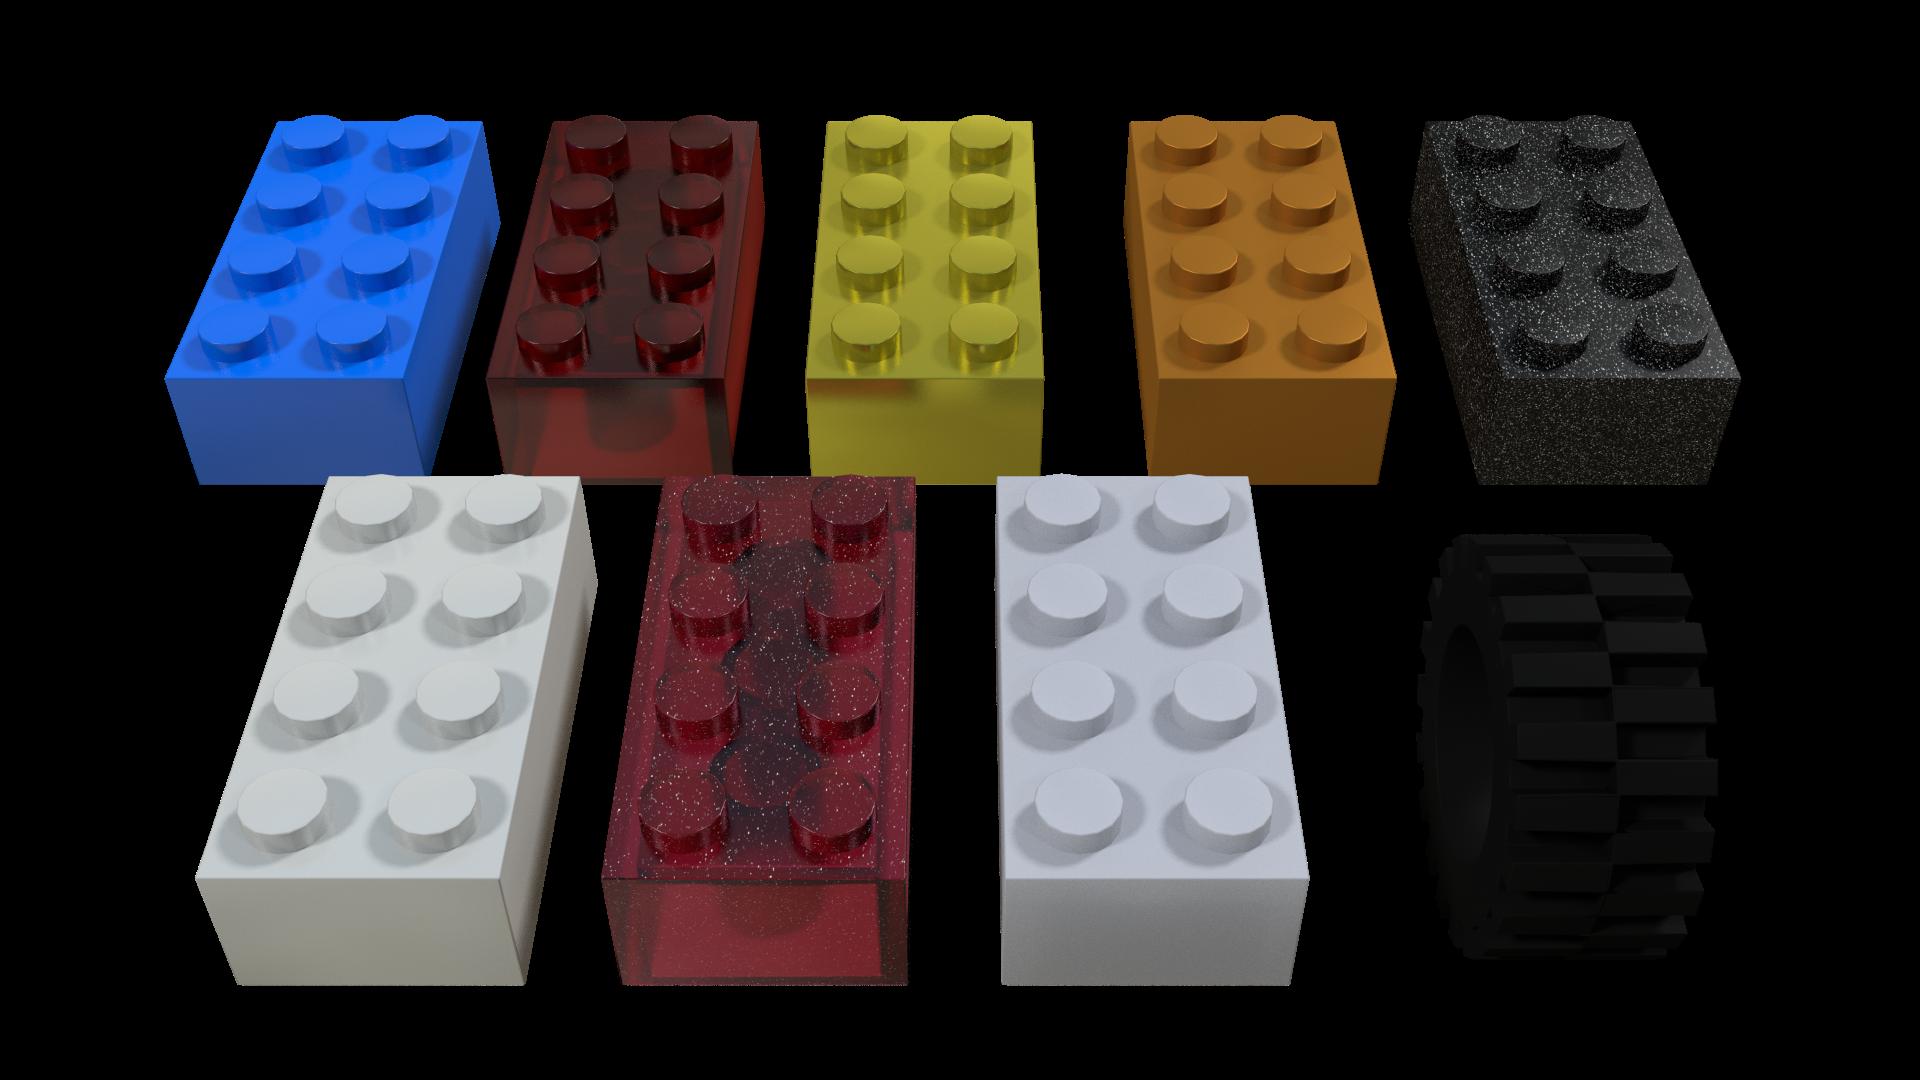 Legos clipart plastic block. Lego materials in blender